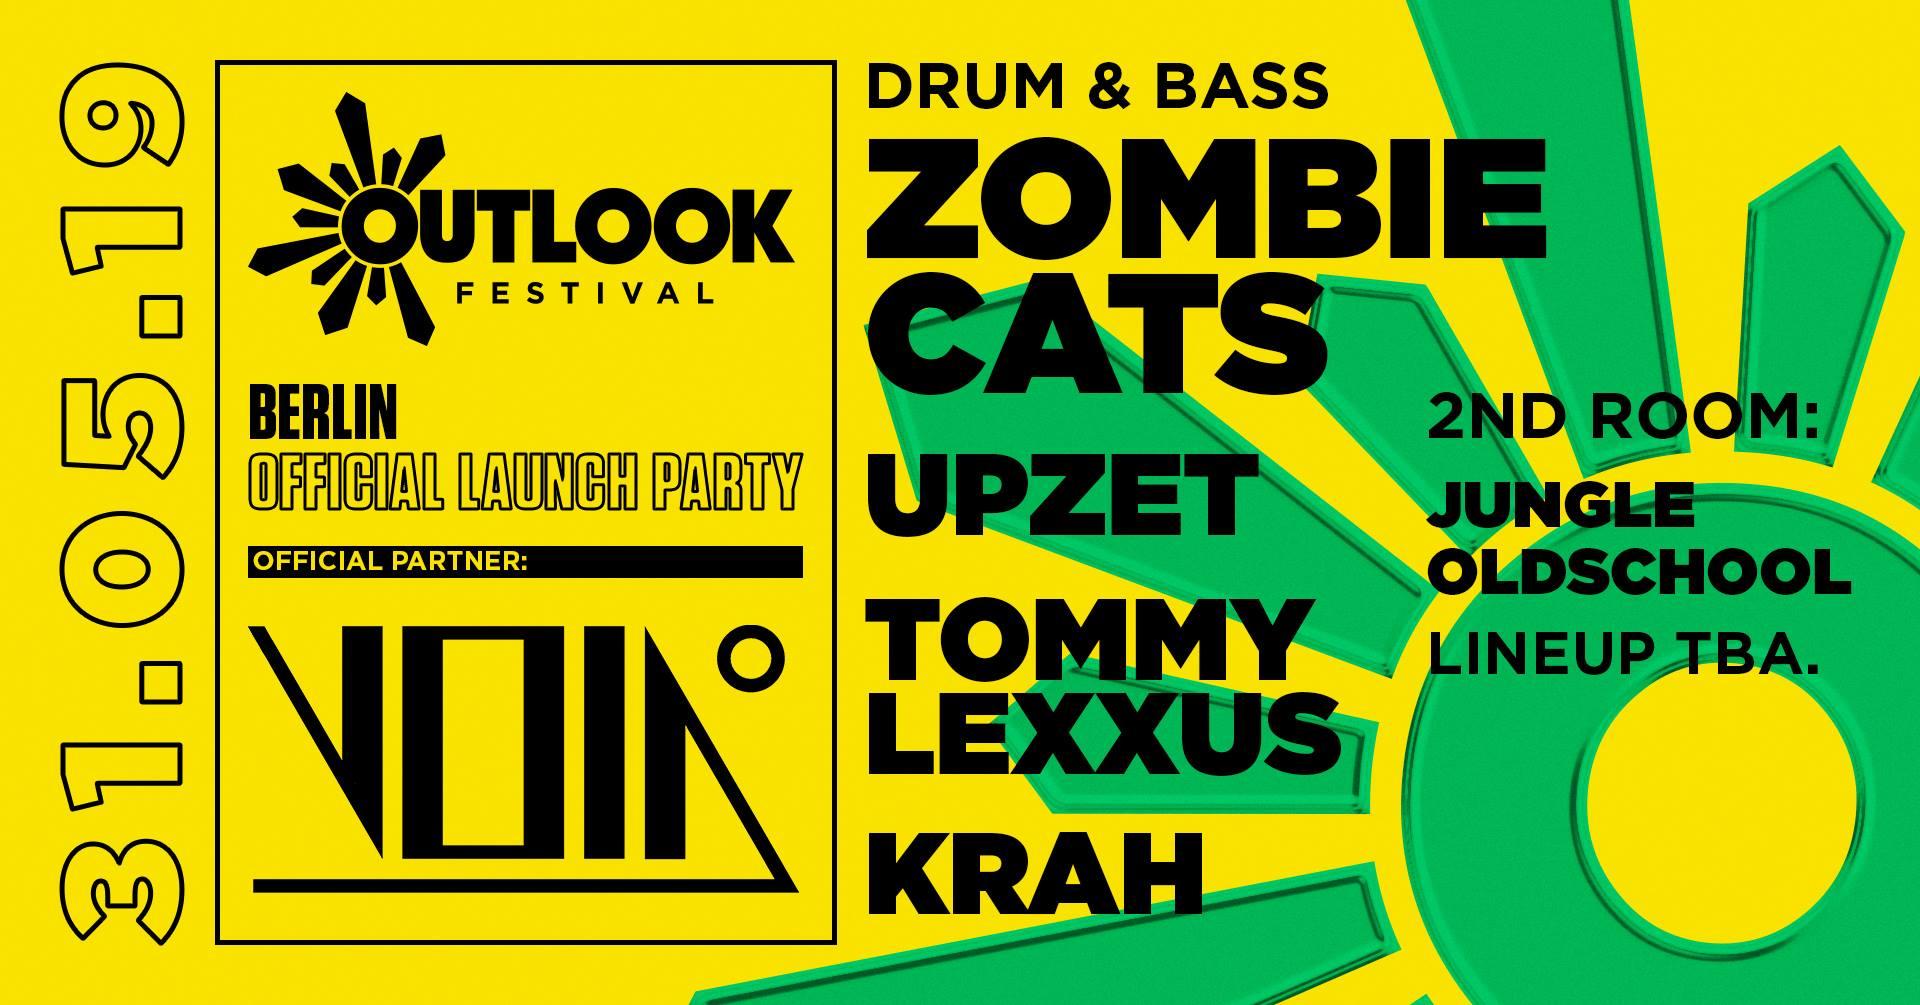 Berlin Outlook Festival Launch Party